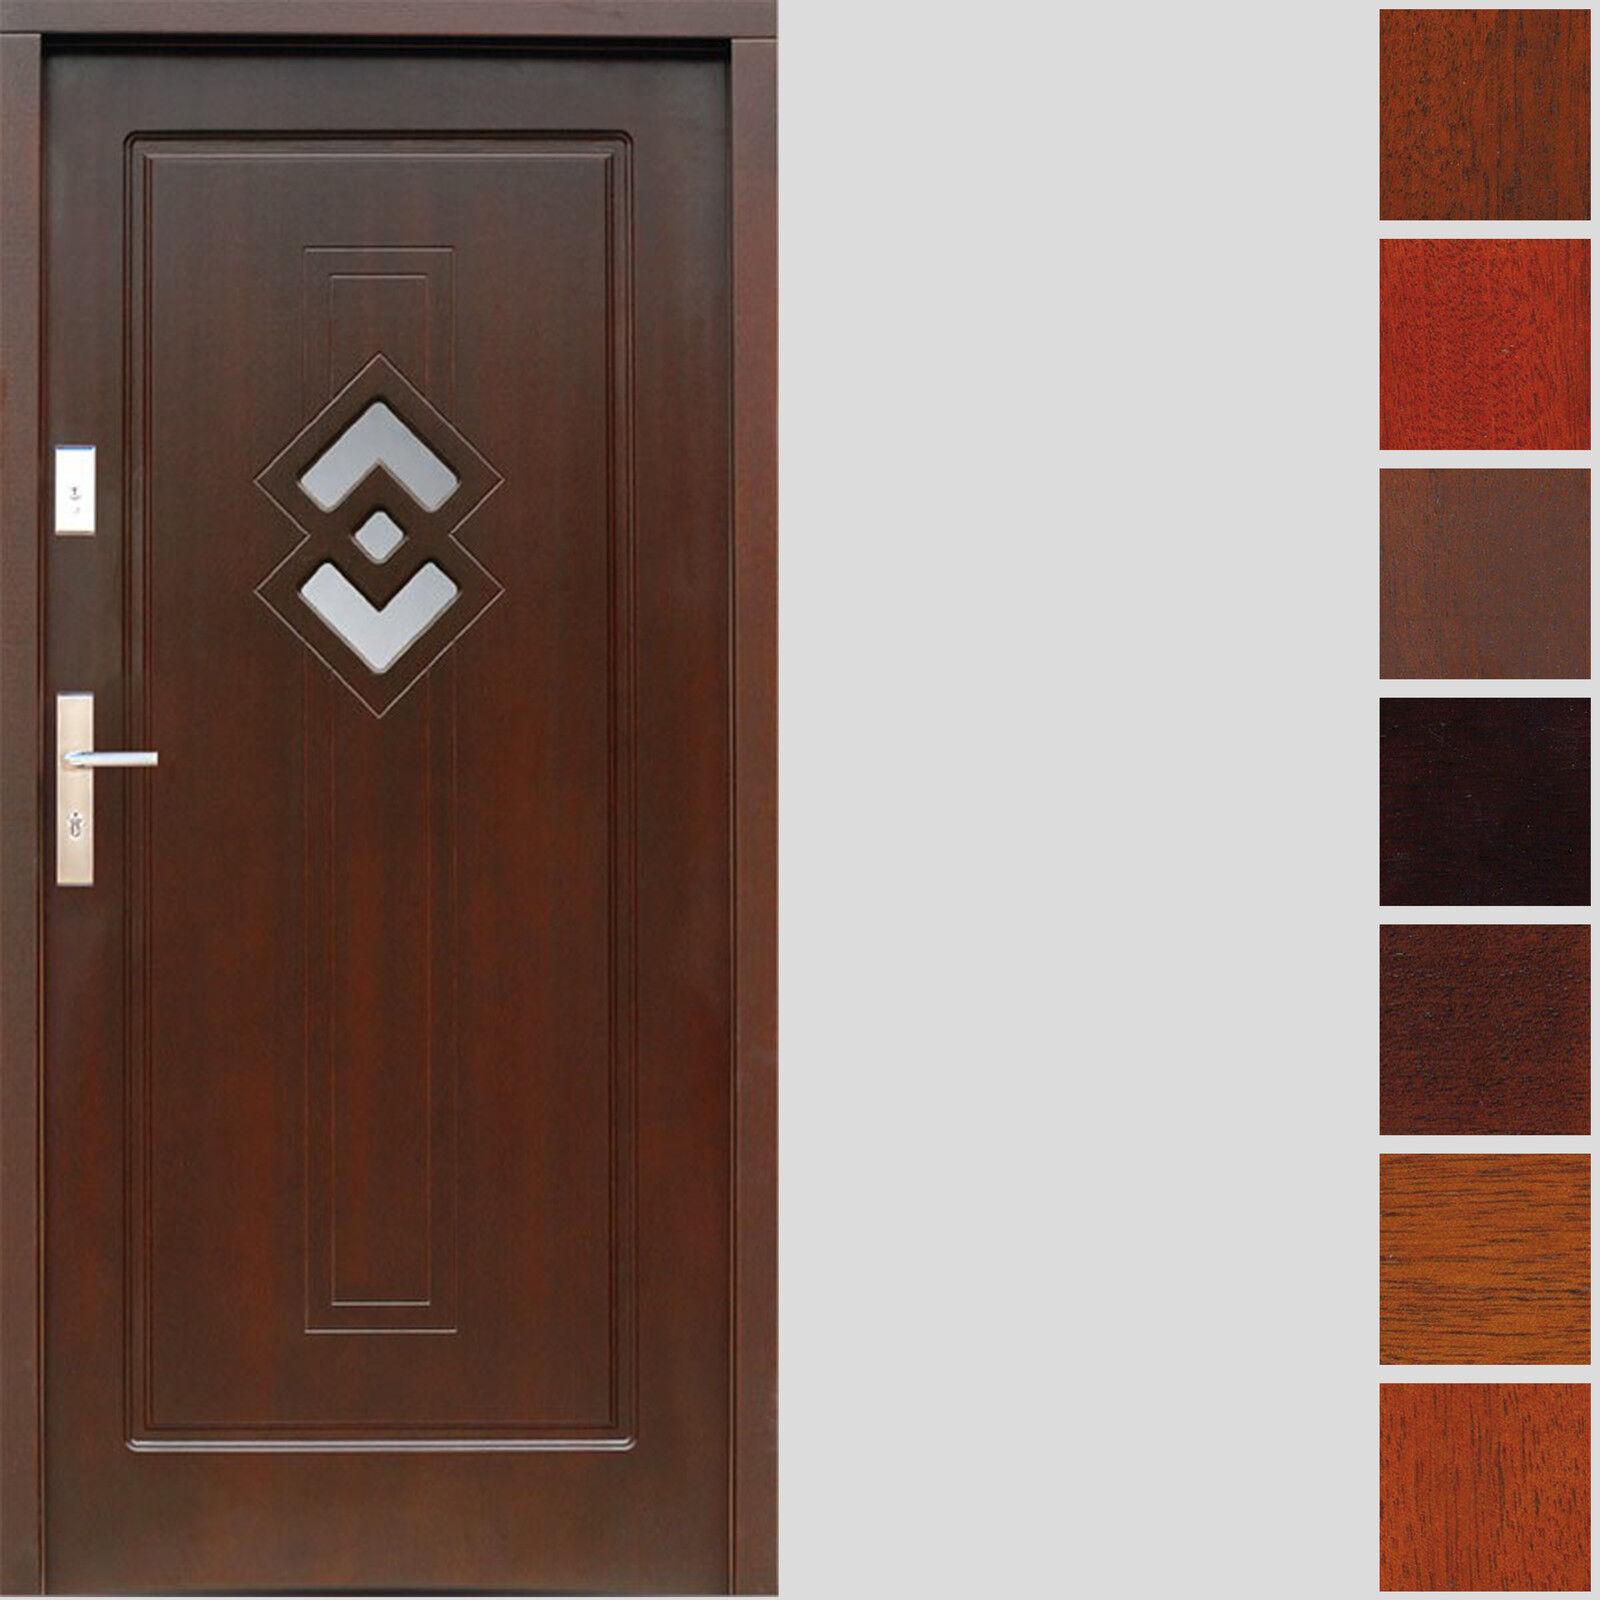 holzau ent r hrejtie t r haust r eingangst r t rplatte holtzt r 80 100 7 farben ebay. Black Bedroom Furniture Sets. Home Design Ideas